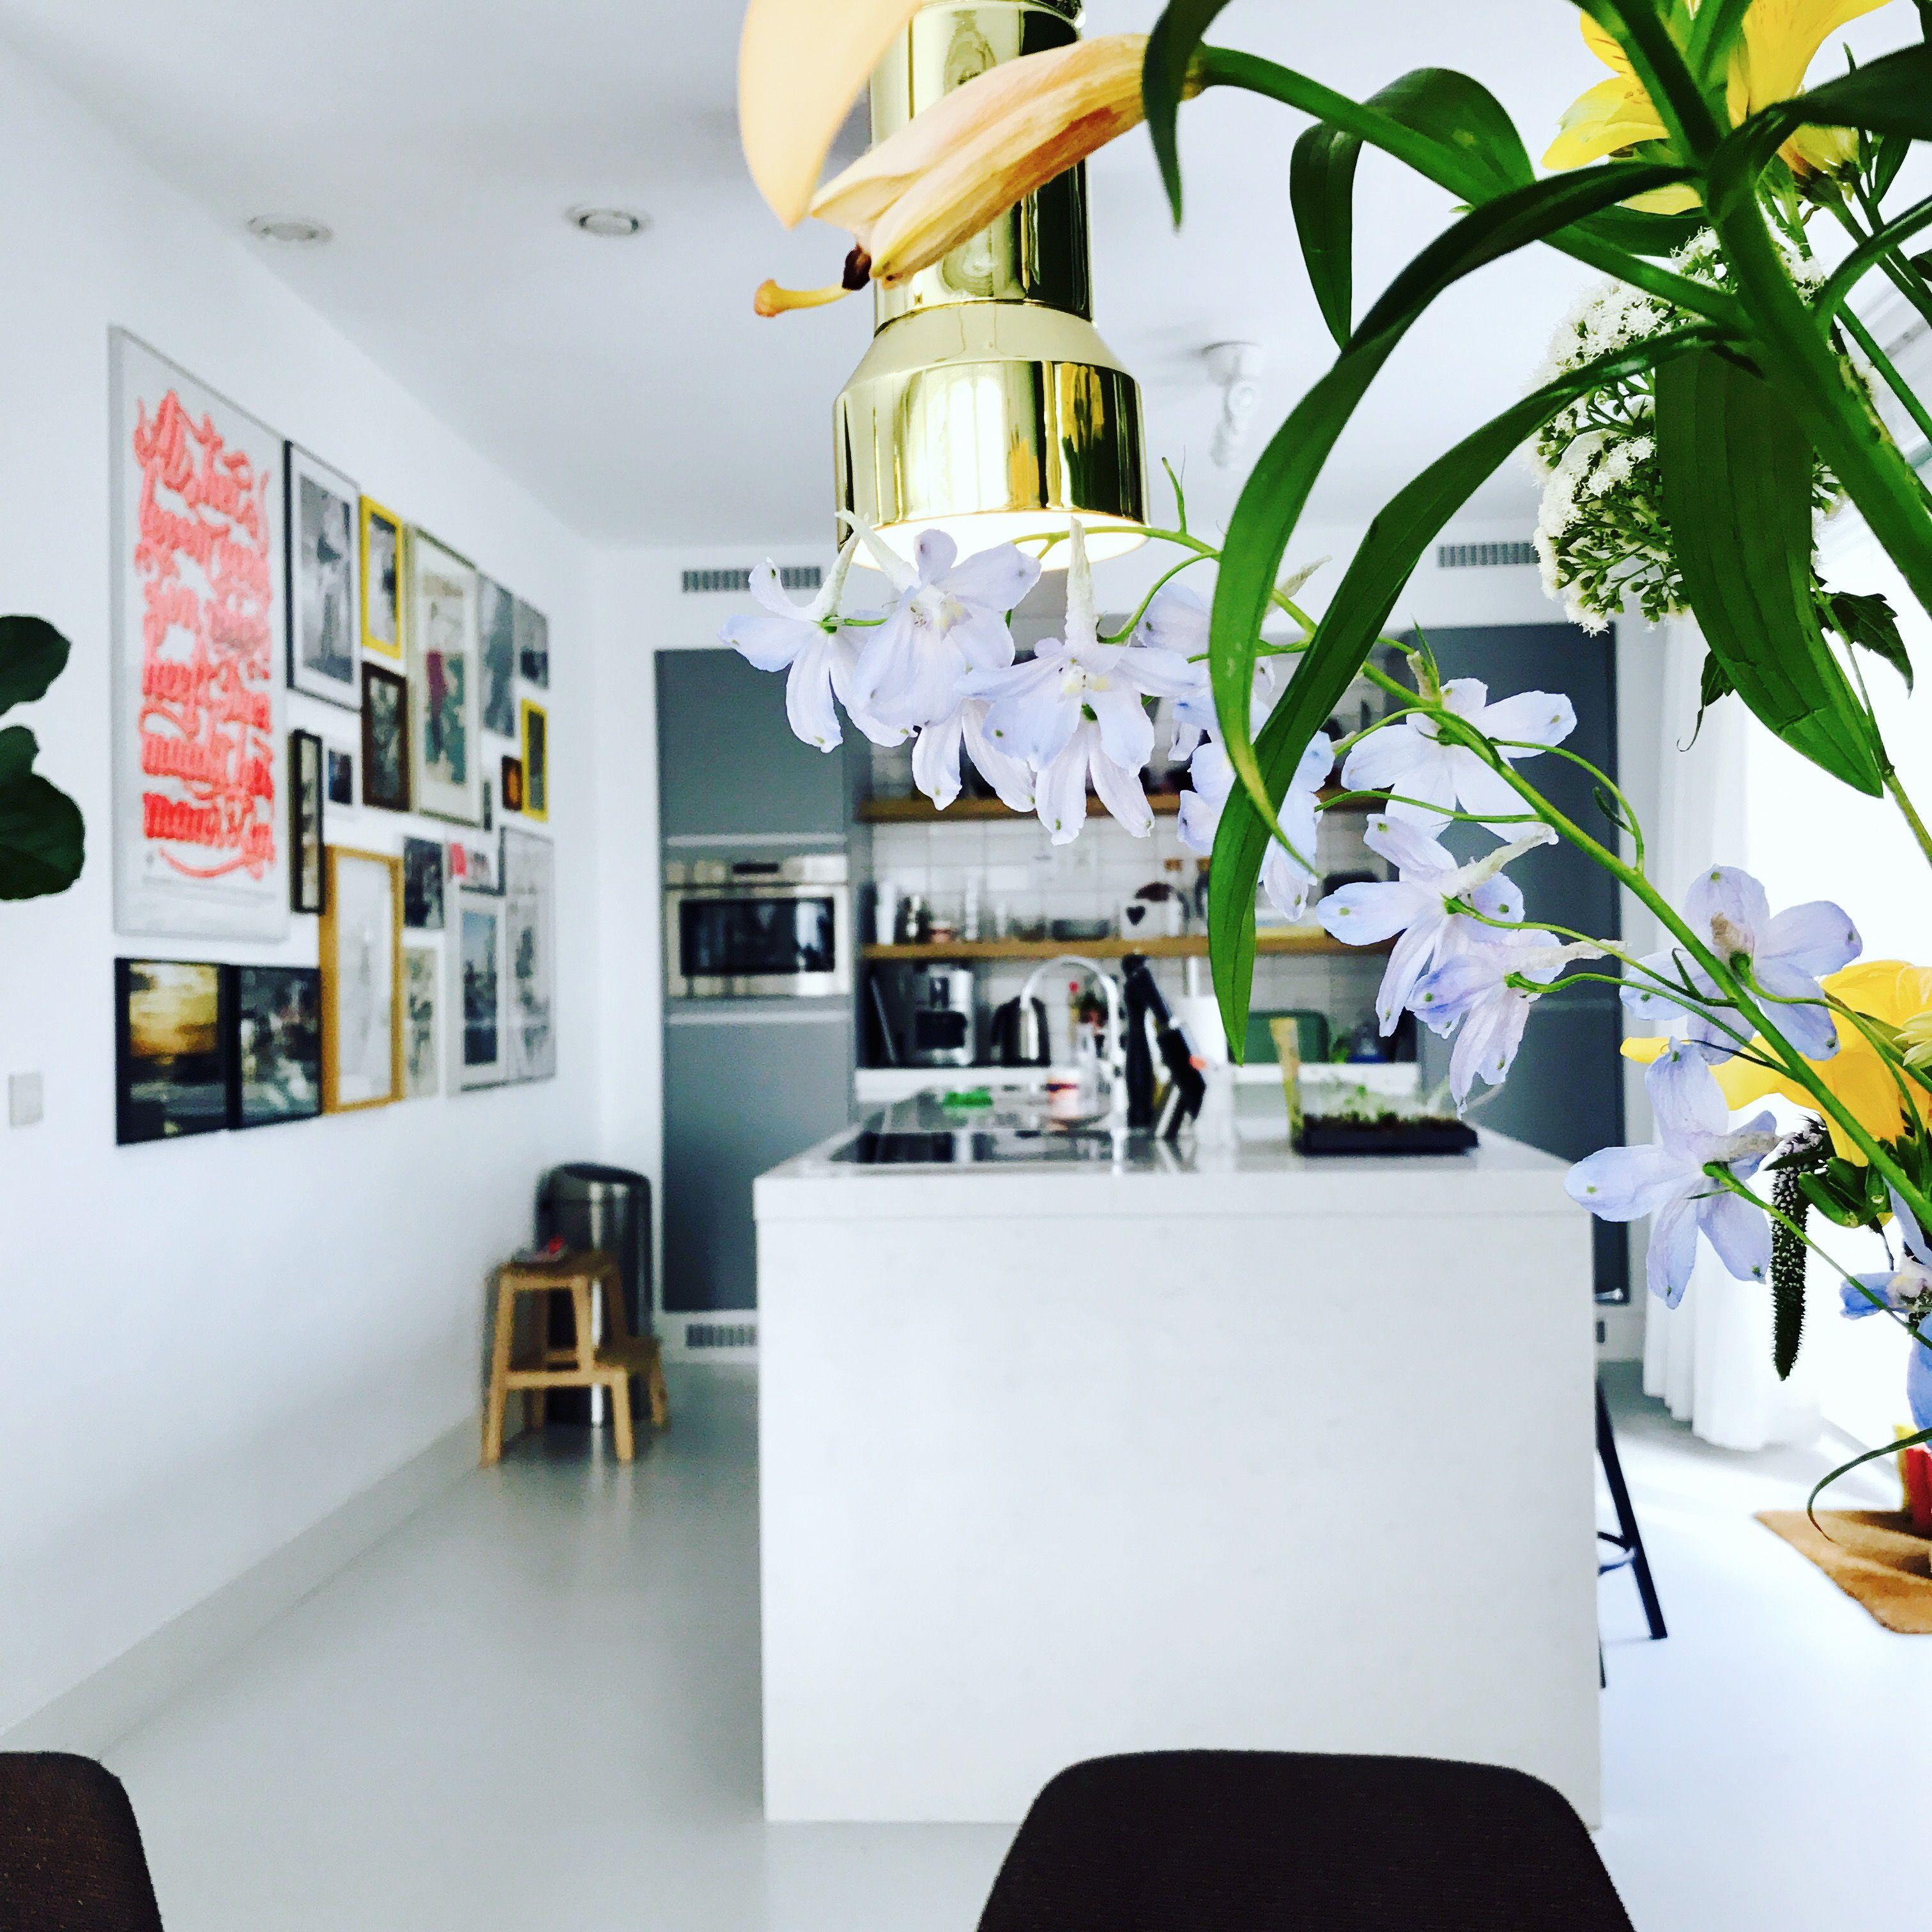 @Stijlvast #Interior #Interiordesign #Styling #Stijlvast #Interiorstyling